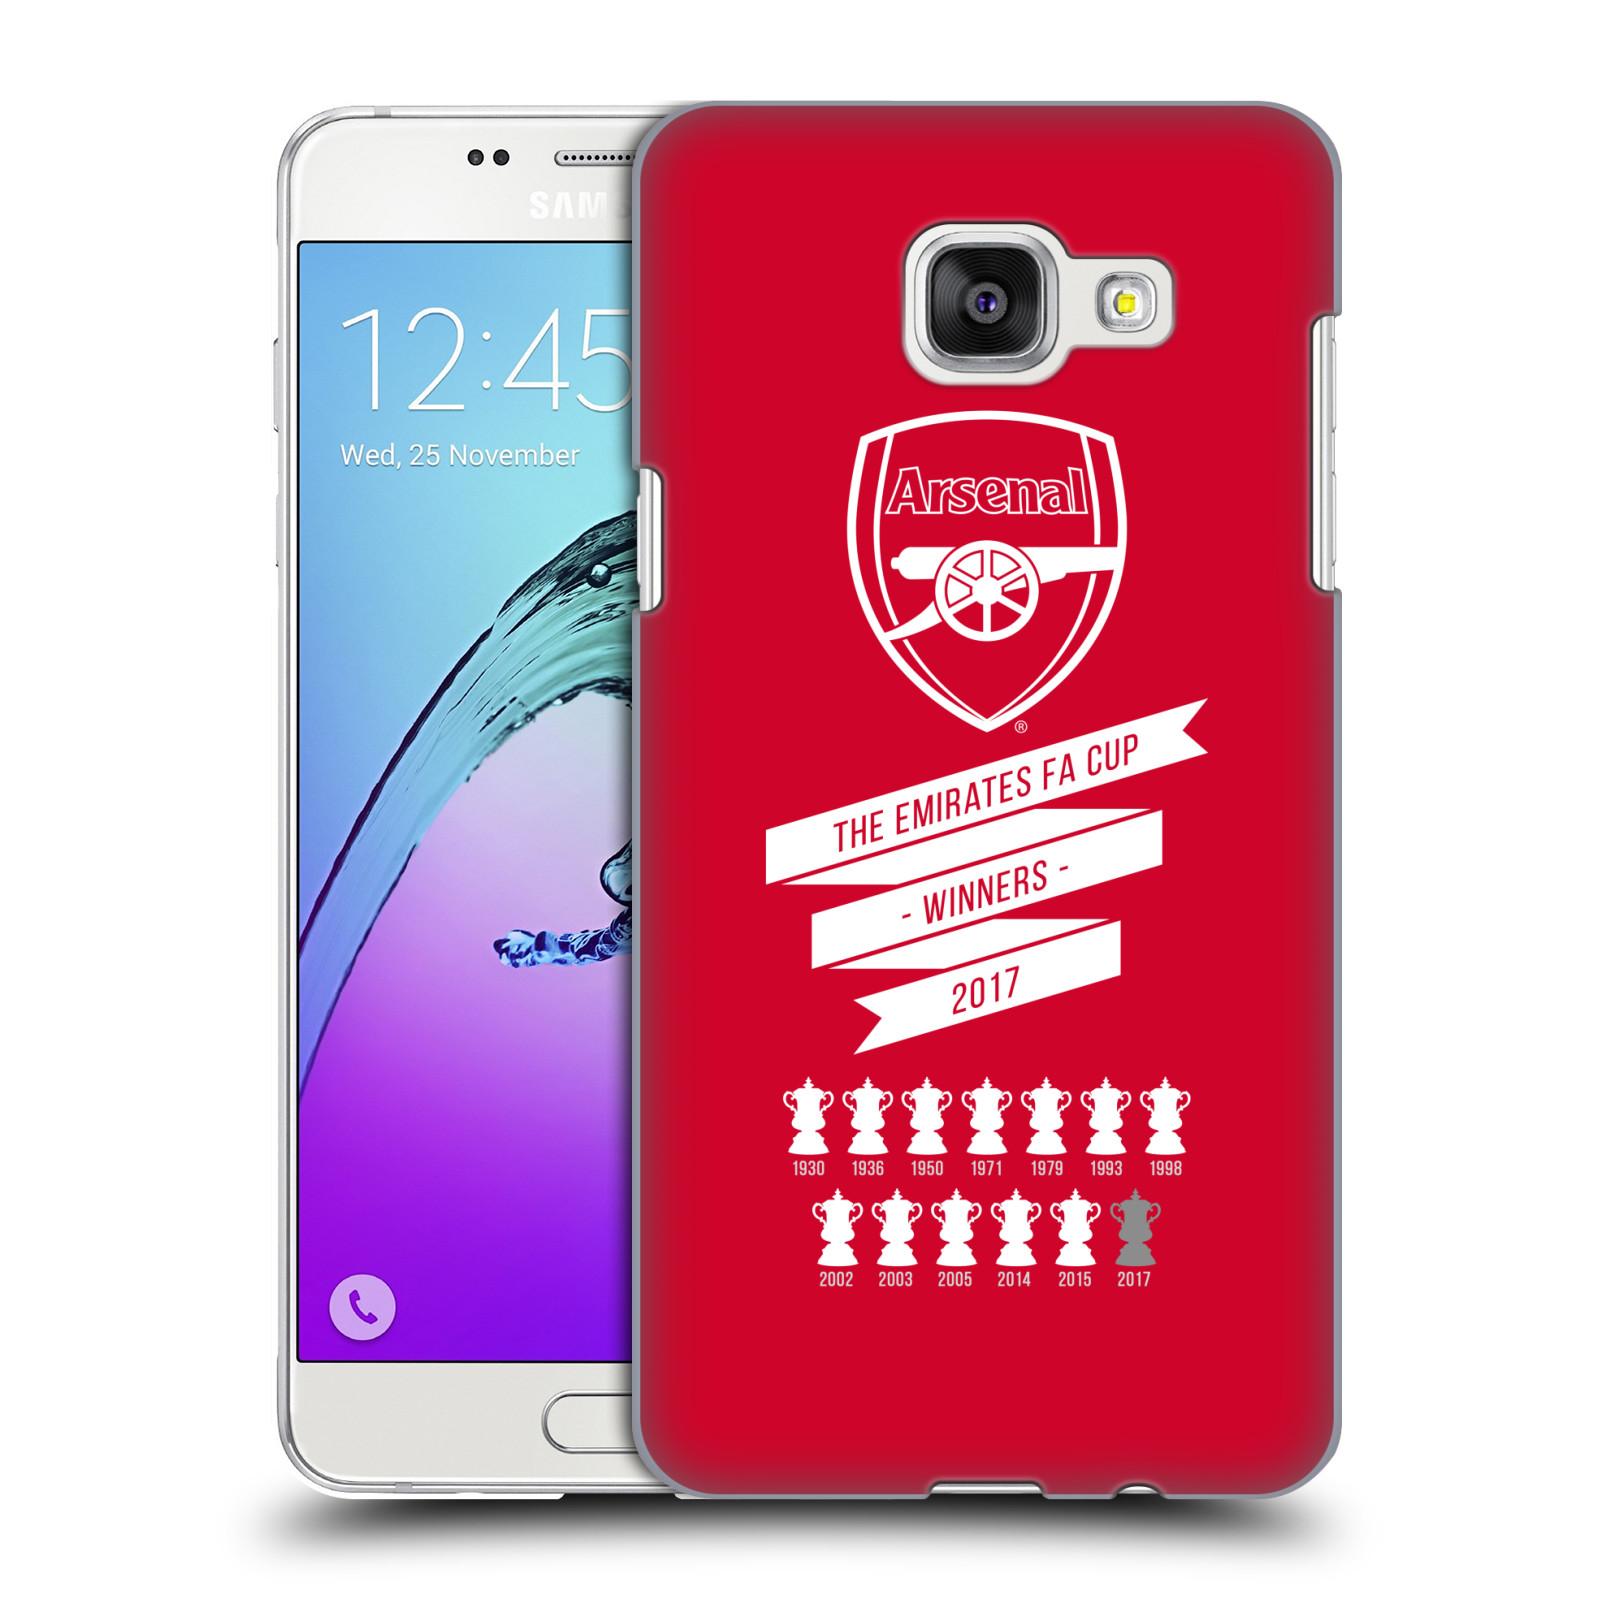 Plastové pouzdro na mobil Samsung Galaxy A5 (2016) - Head Case - Arsenal FC - 13 Wins